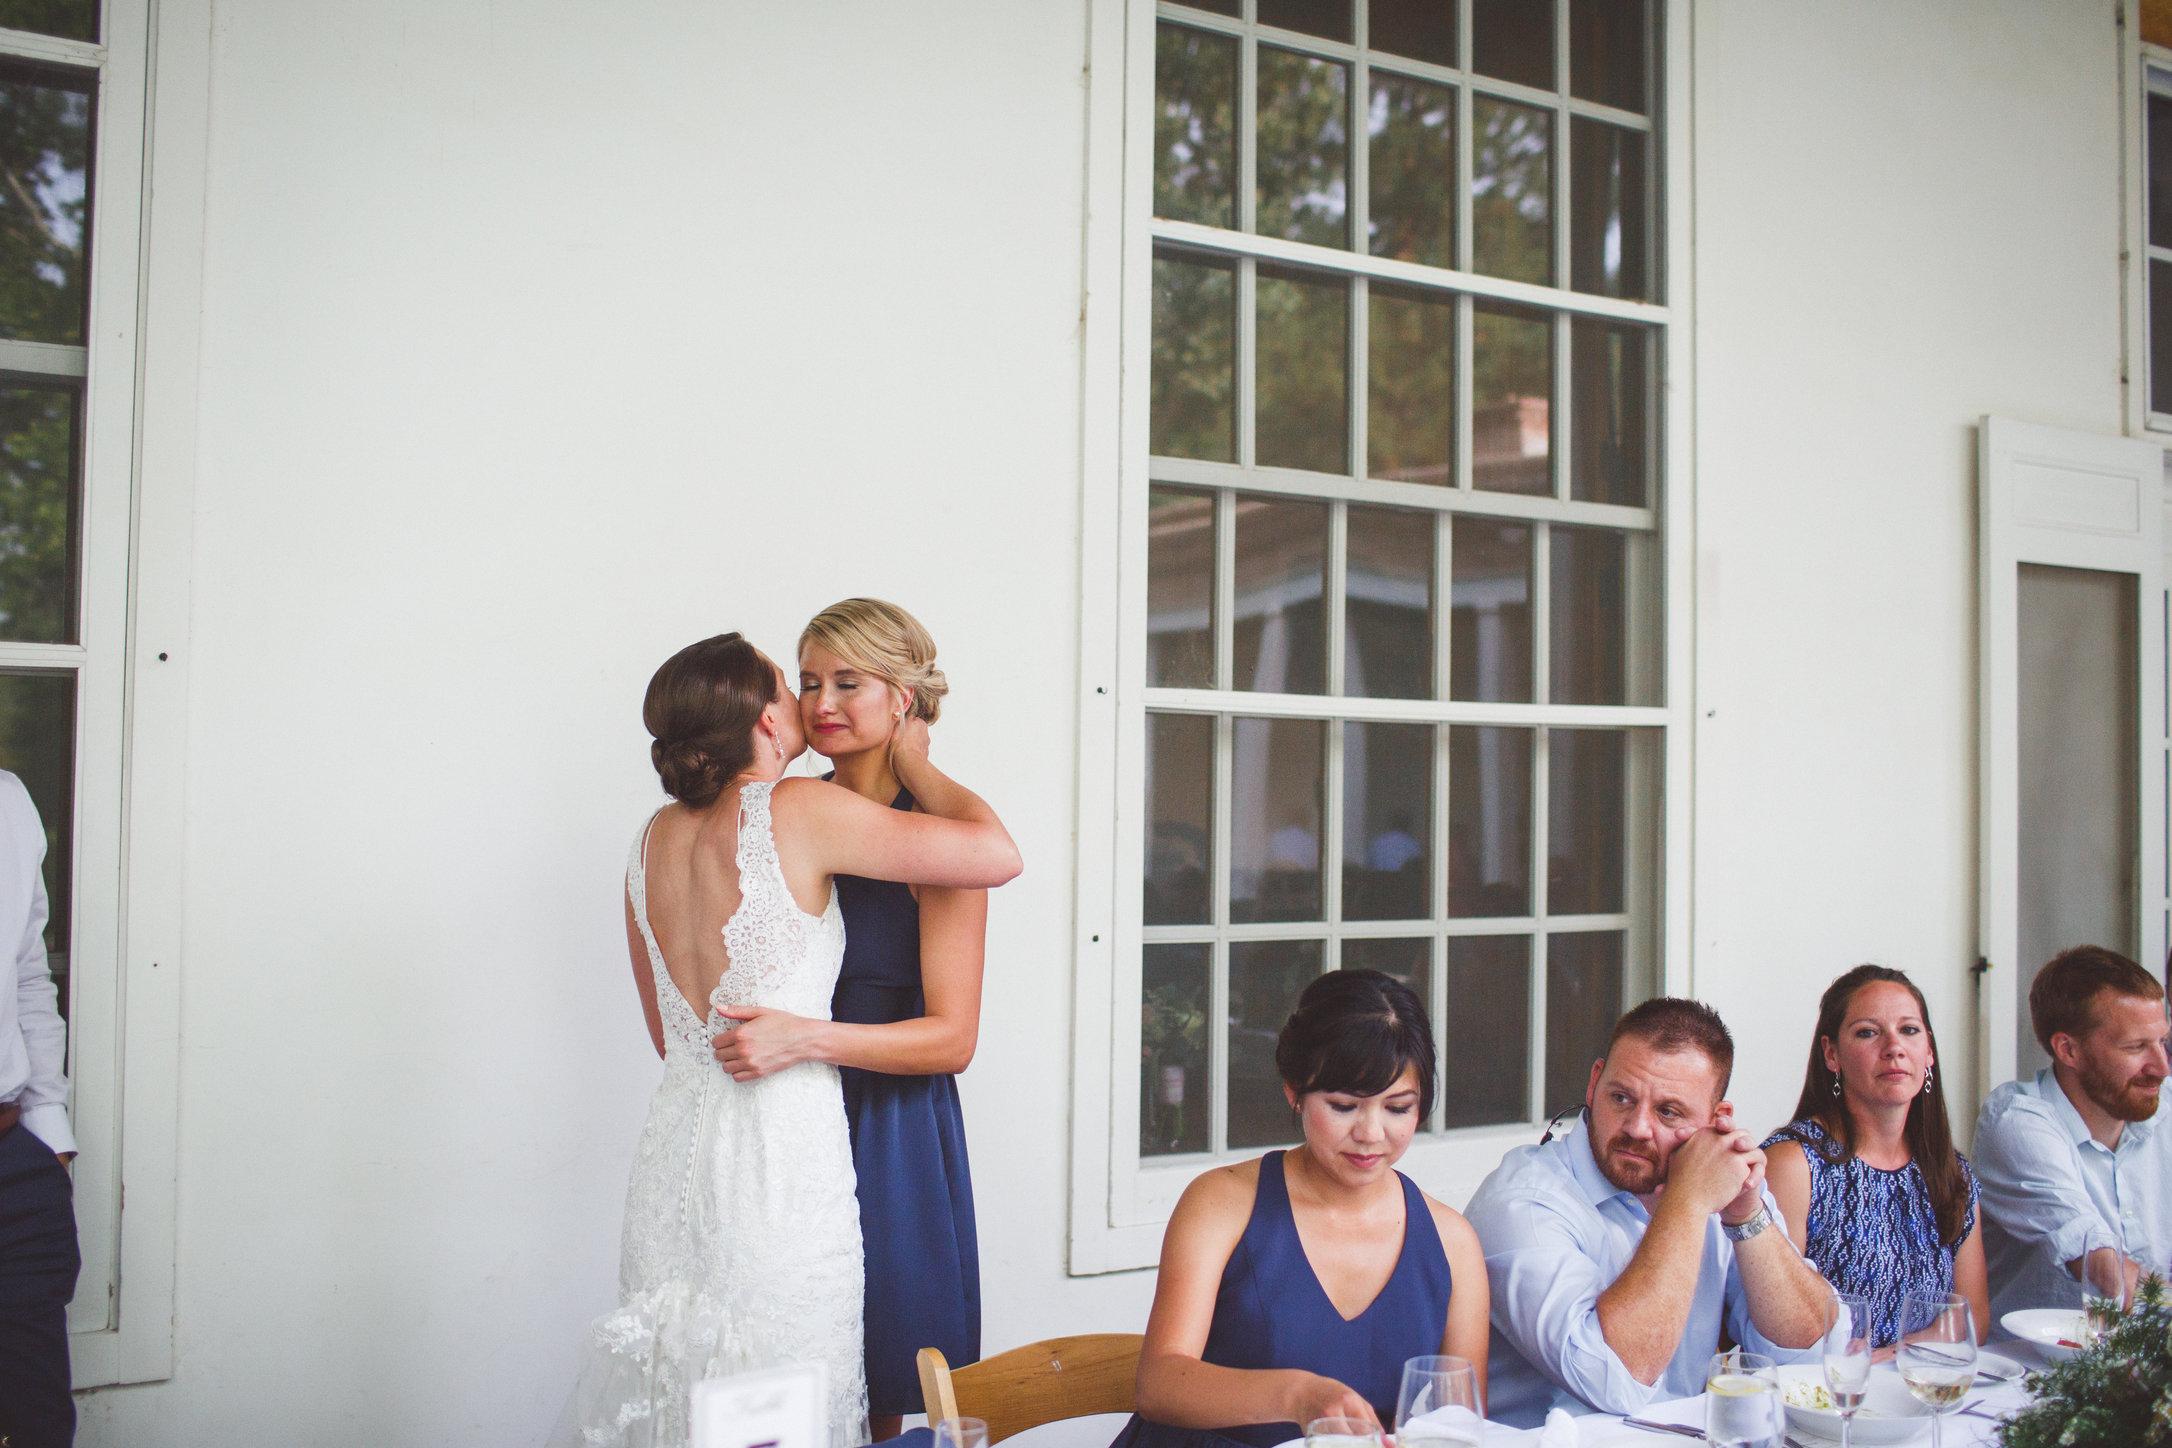 SandC-wedding-525.jpg